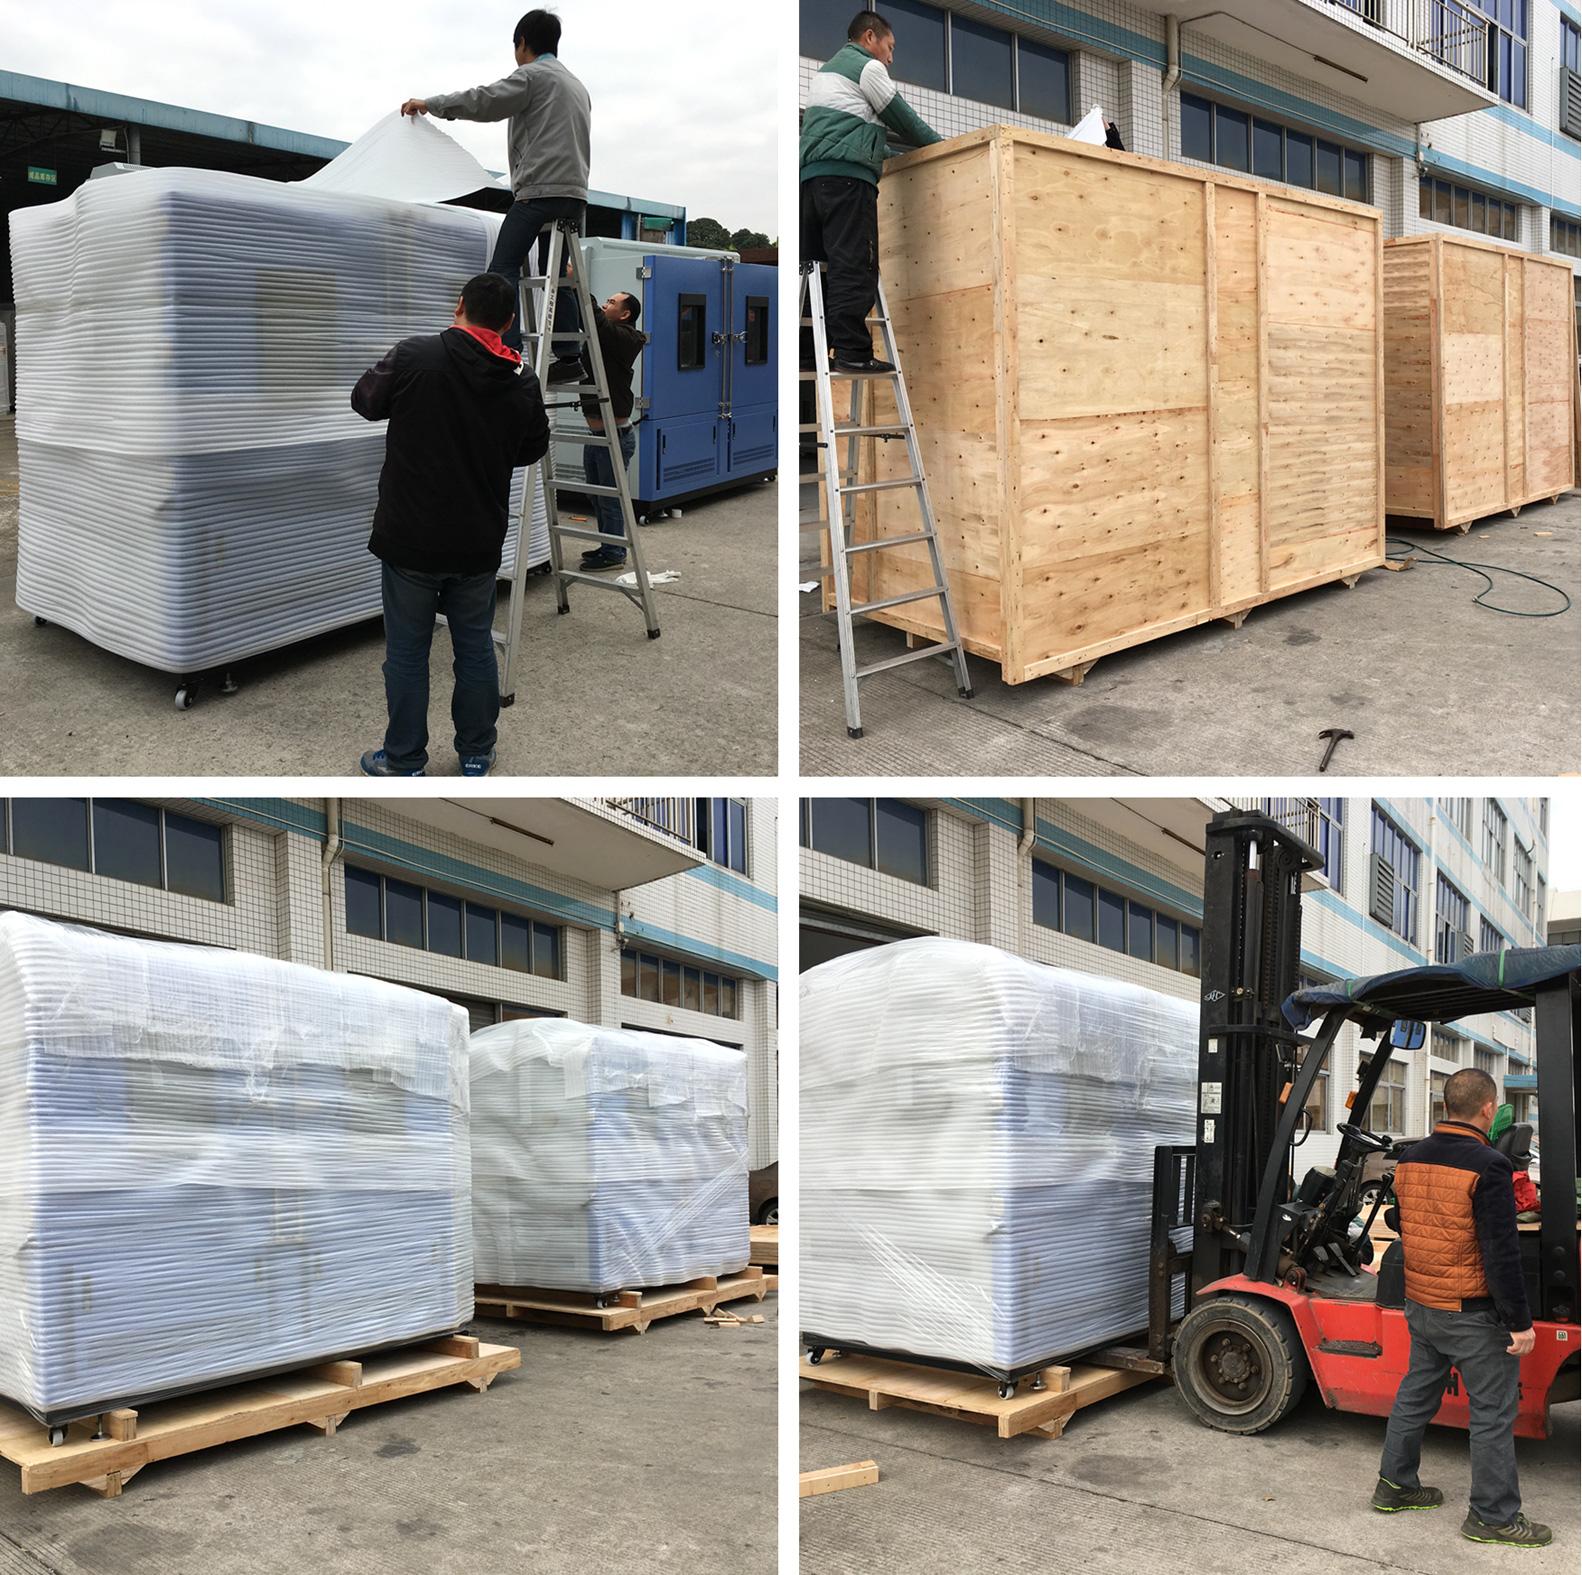 2018-02-08 Shipment